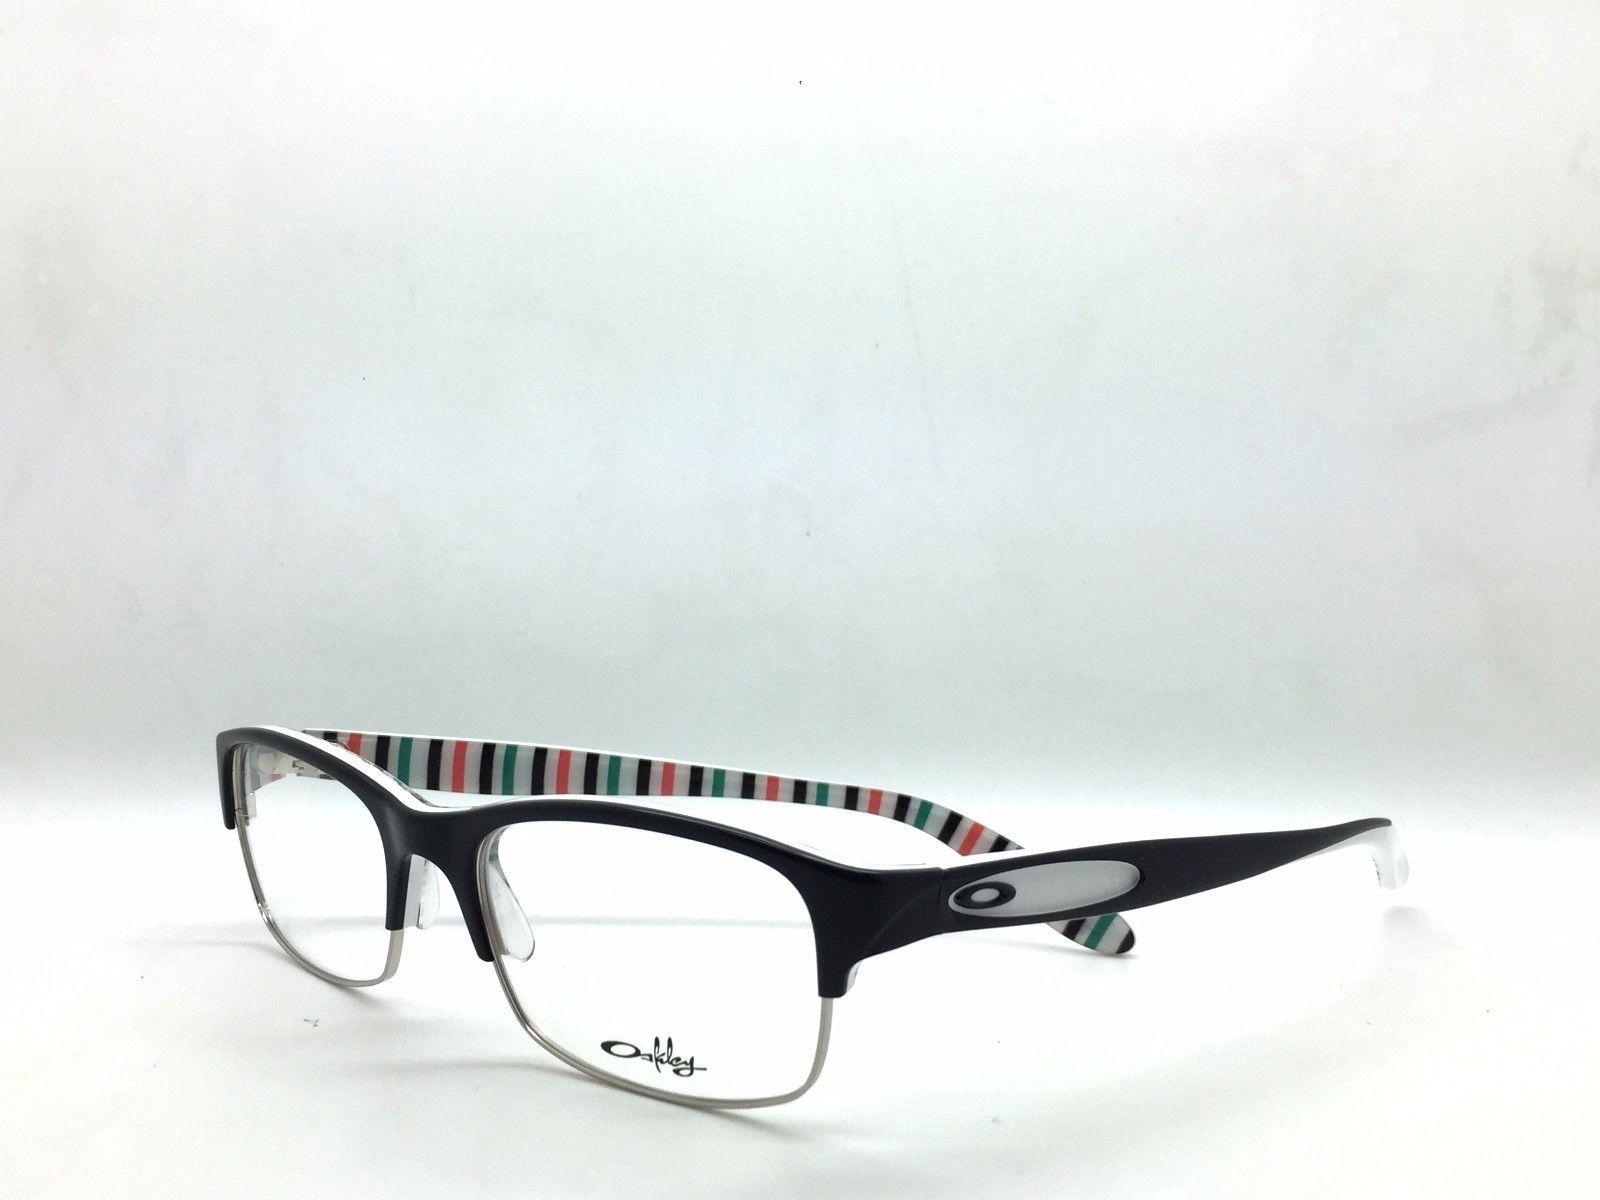 8b4f8031ec Oakley Authentic 52mm Eyeglasses Demo Lenses and 41 similar items. 57